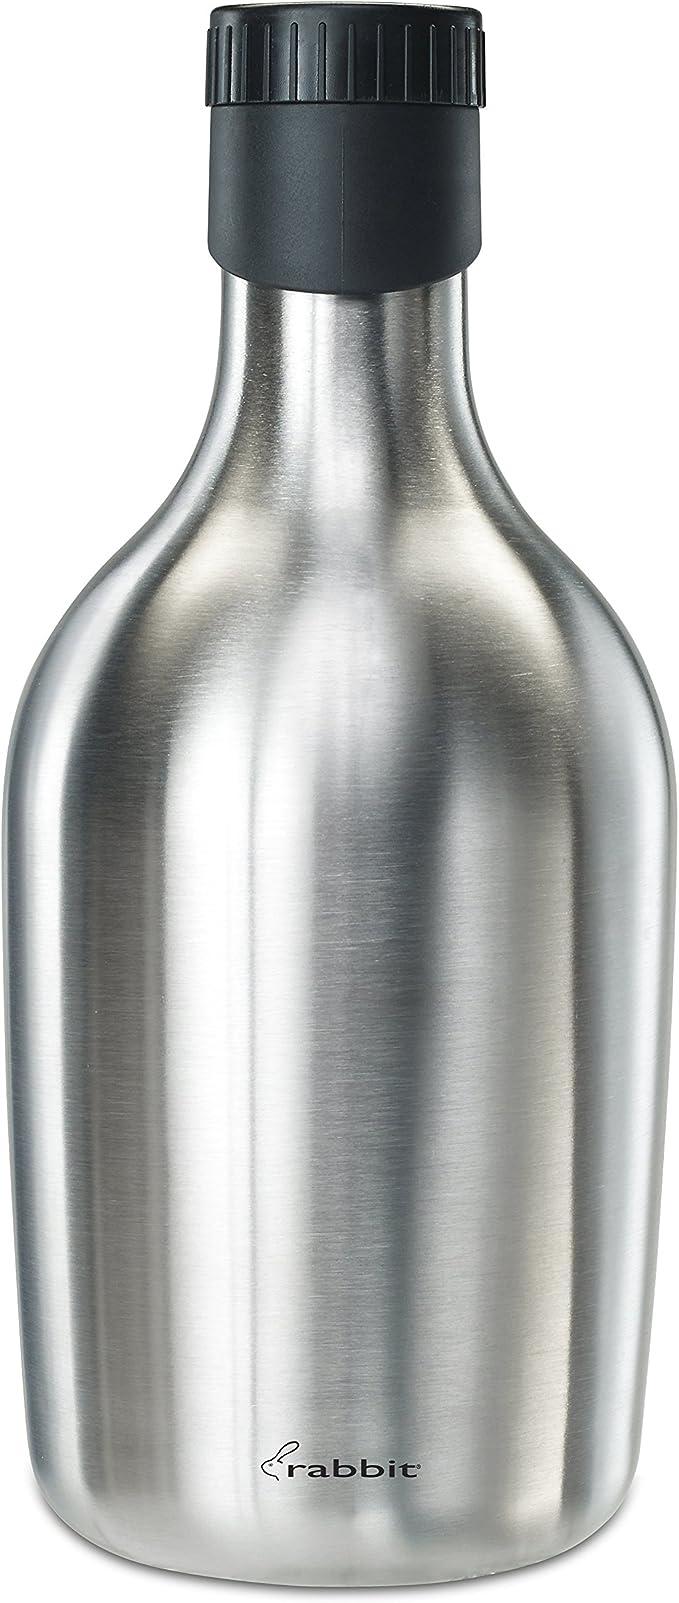 Rabbit Growler Stainless Steel W4720